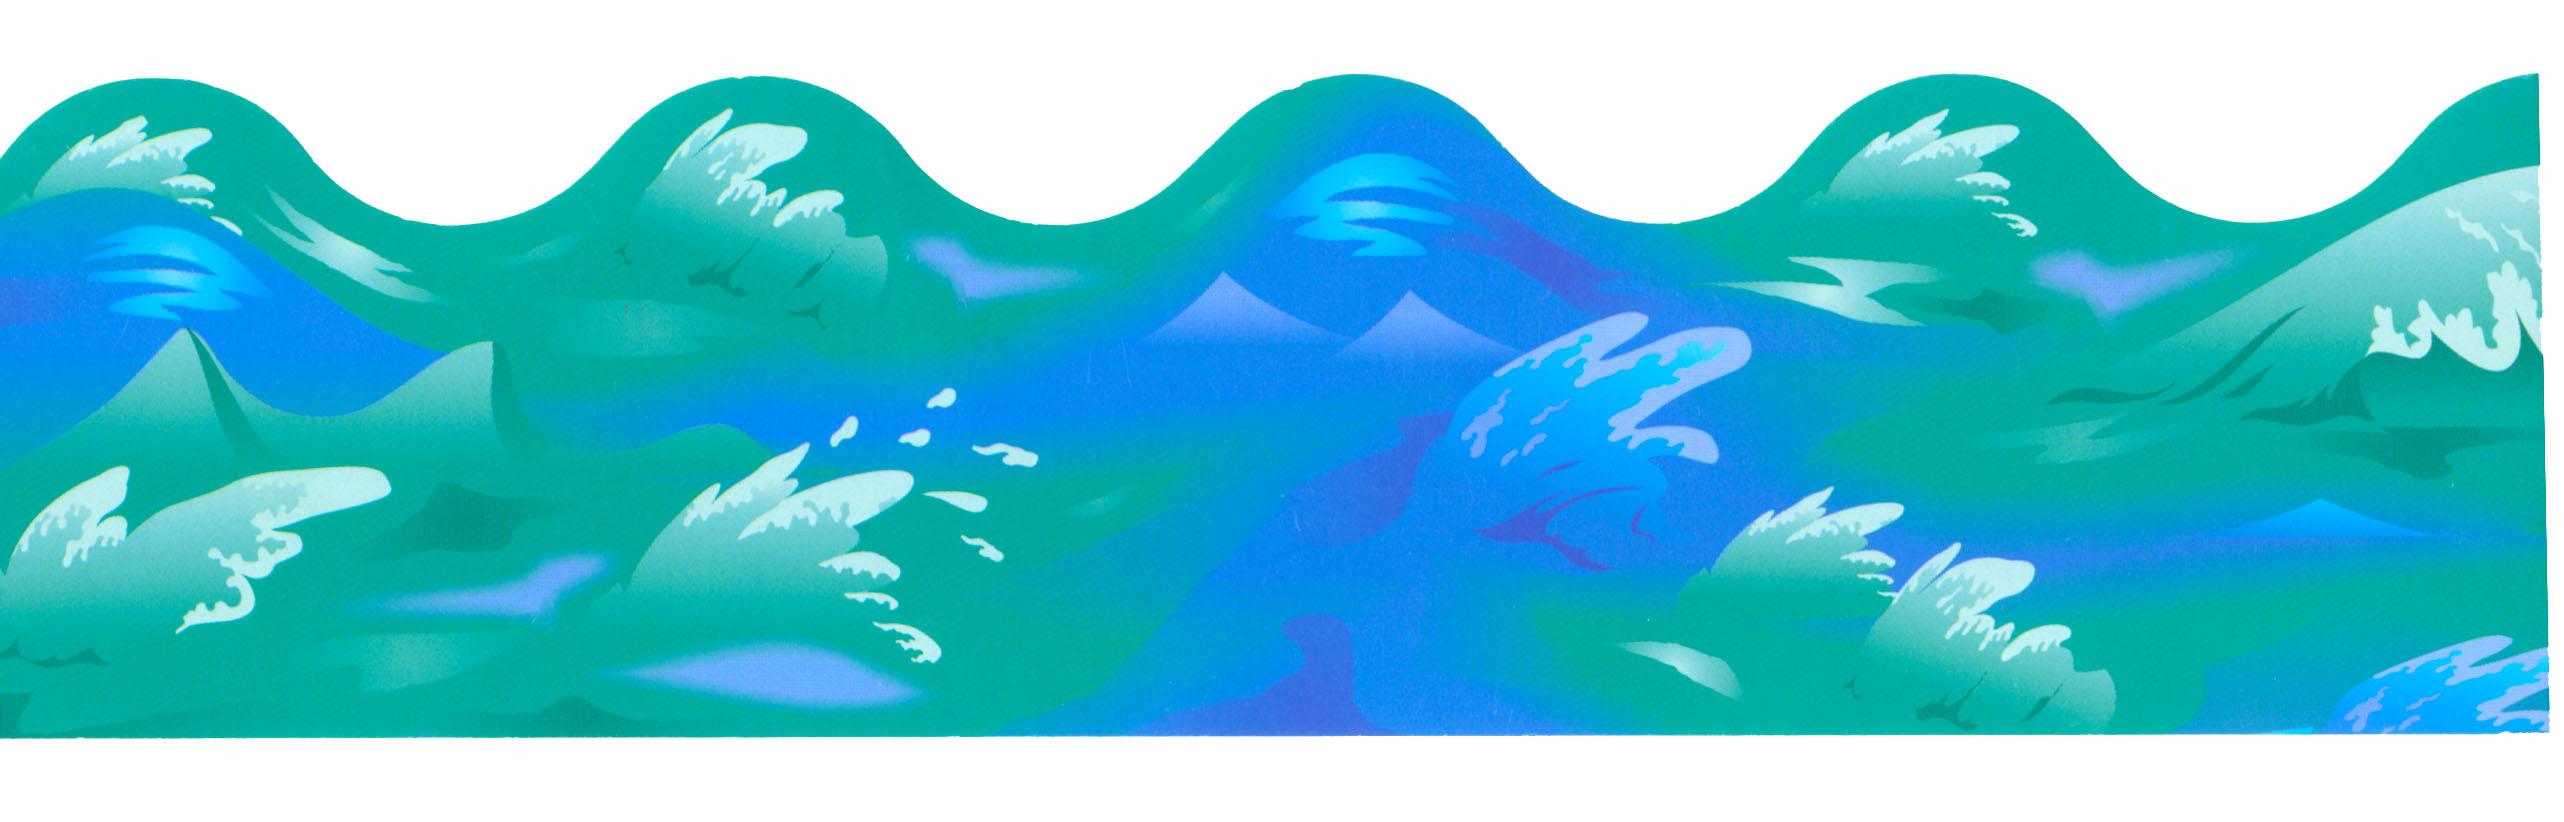 2564x822 Wave Clipart Beach Wave